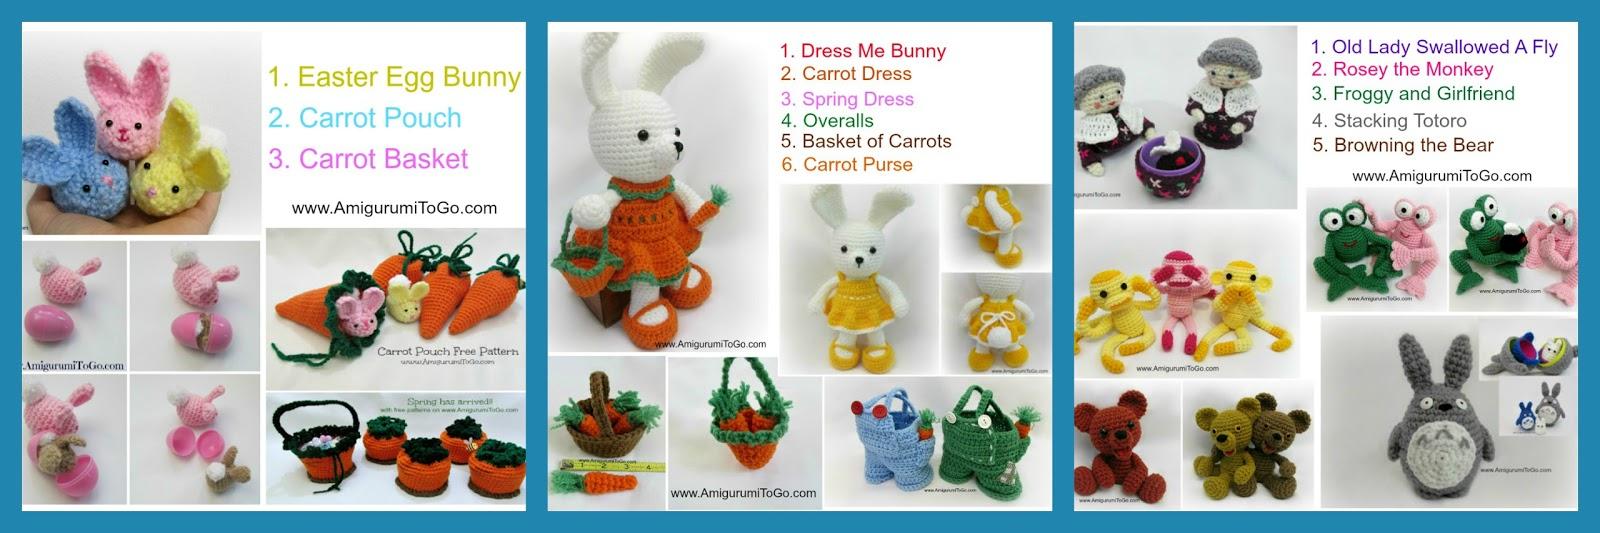 Amigurumi Easter Egg Pattern : Easter Amigurumi Patterns ~ Amigurumi To Go